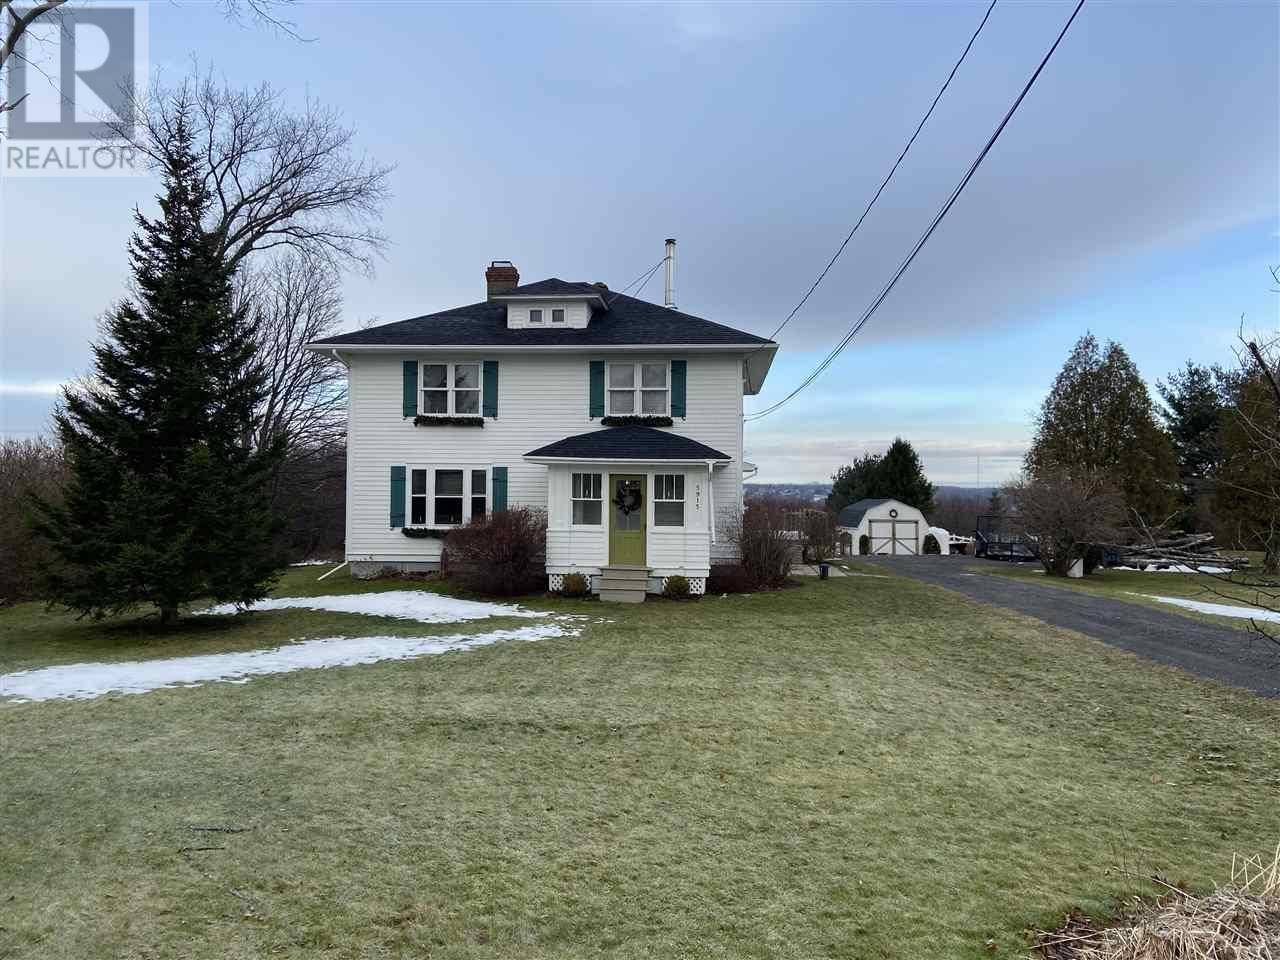 House for sale at 5915 Pictou Landing Rd Pictou Landing Nova Scotia - MLS: 201919413